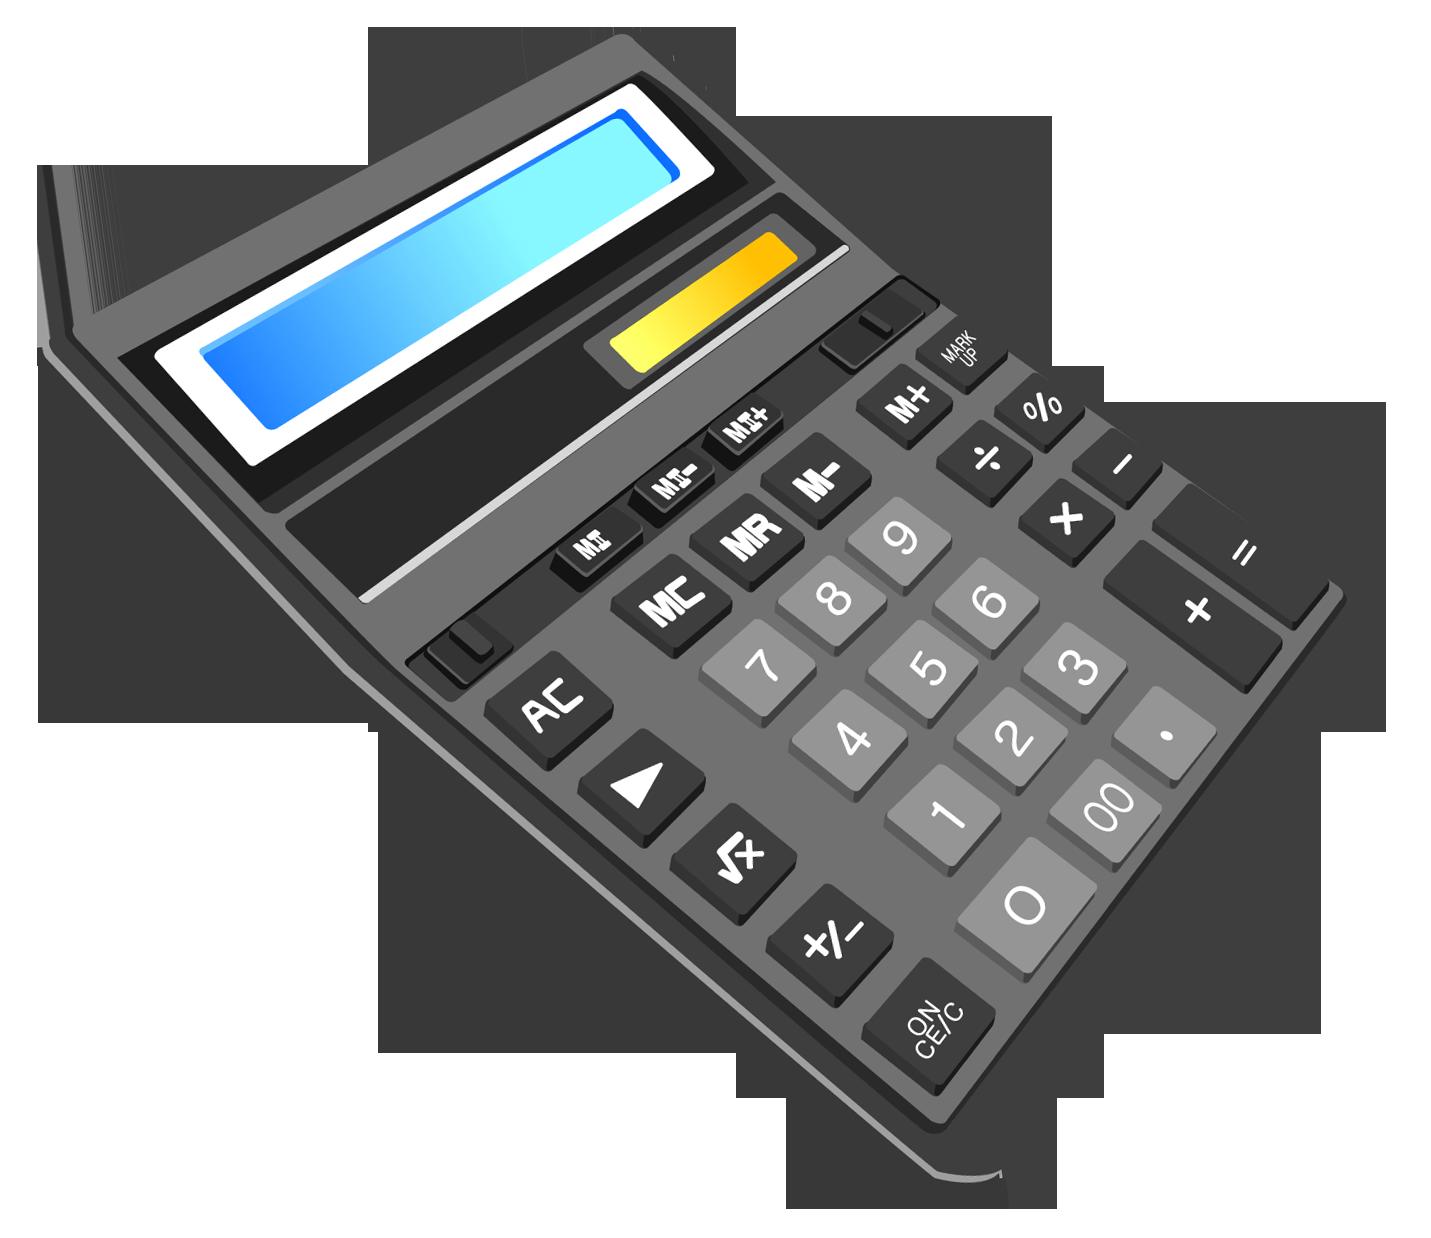 Calculator clipart solar calculator. Powered calculation scientific